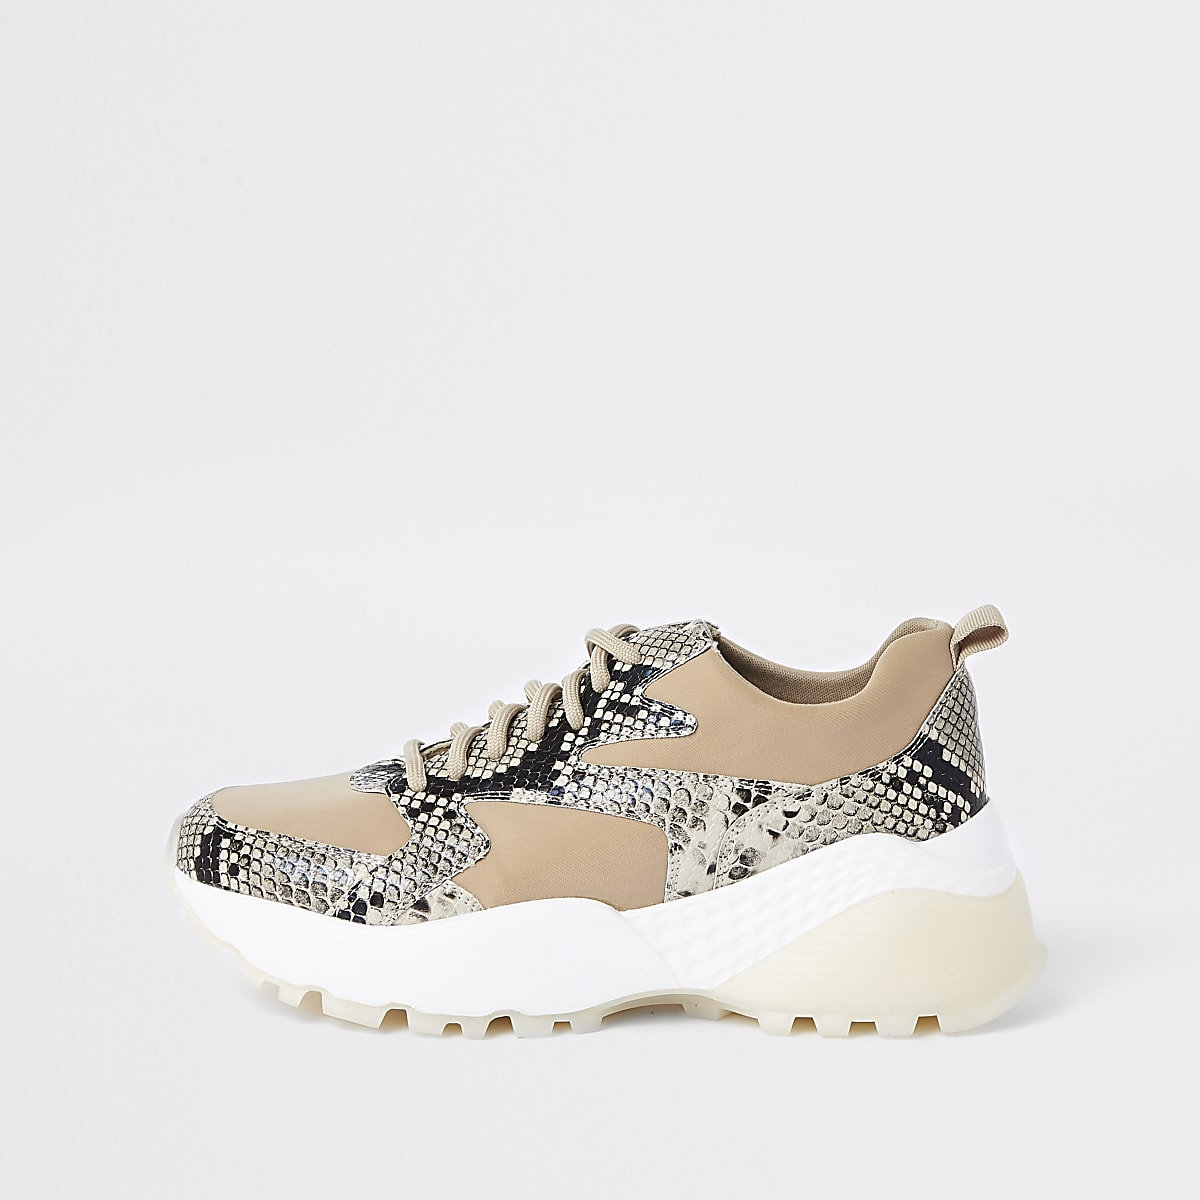 Beige snake print lace-up runner sneakers